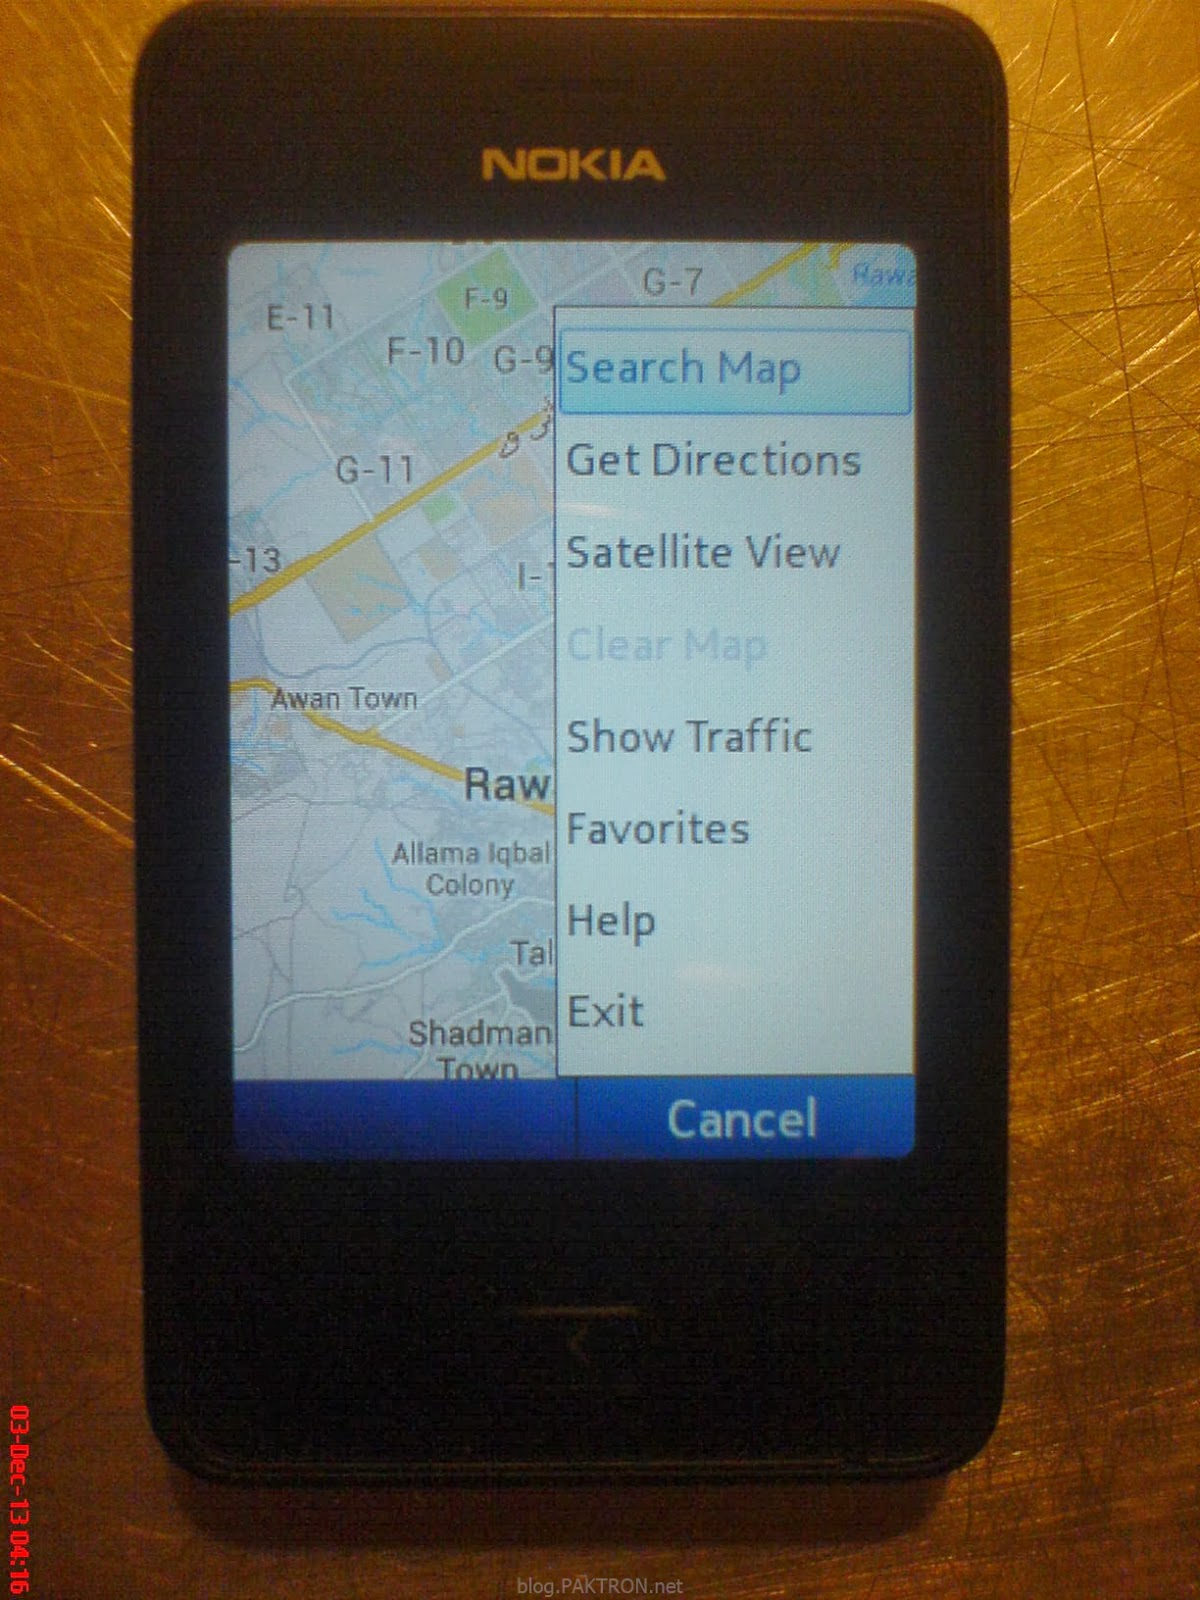 Download google maps java app for nokia asha 501 paktron nokia asha 501 google maps sciox Gallery